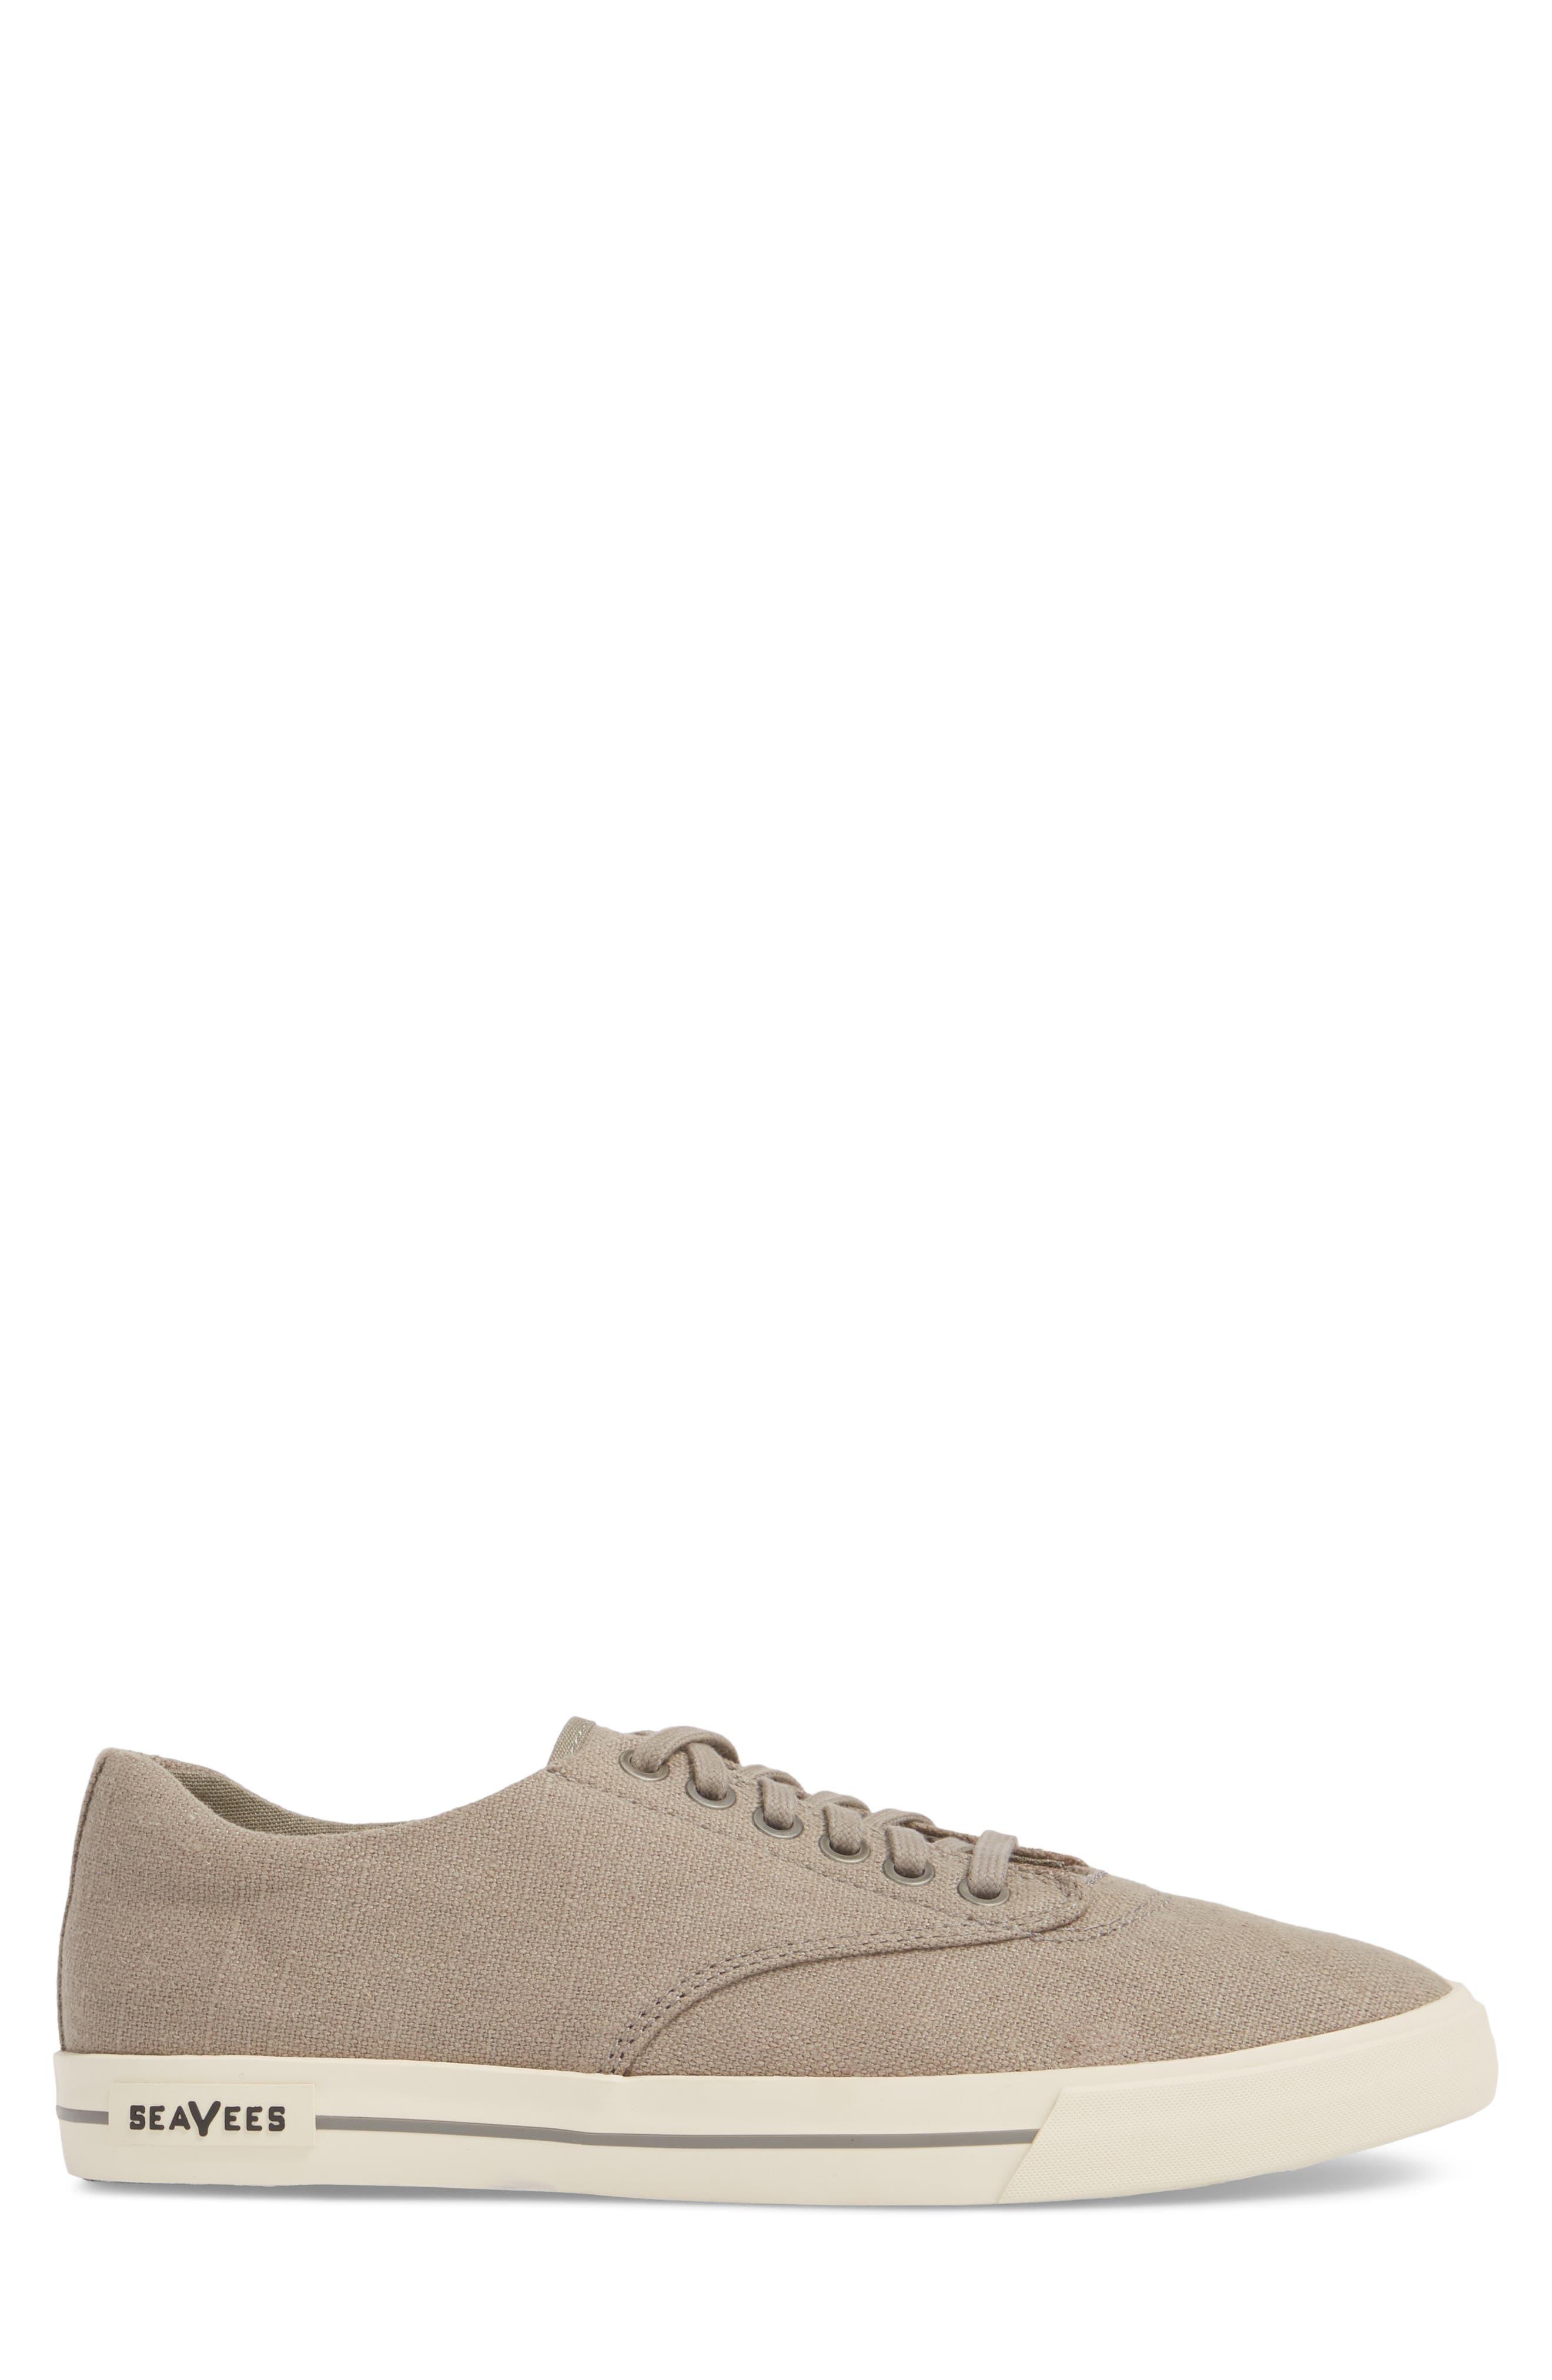 'Hermosa Plimsoll' Sneaker,                             Alternate thumbnail 3, color,                             TIN GREY VINTAGE WASH LINEN